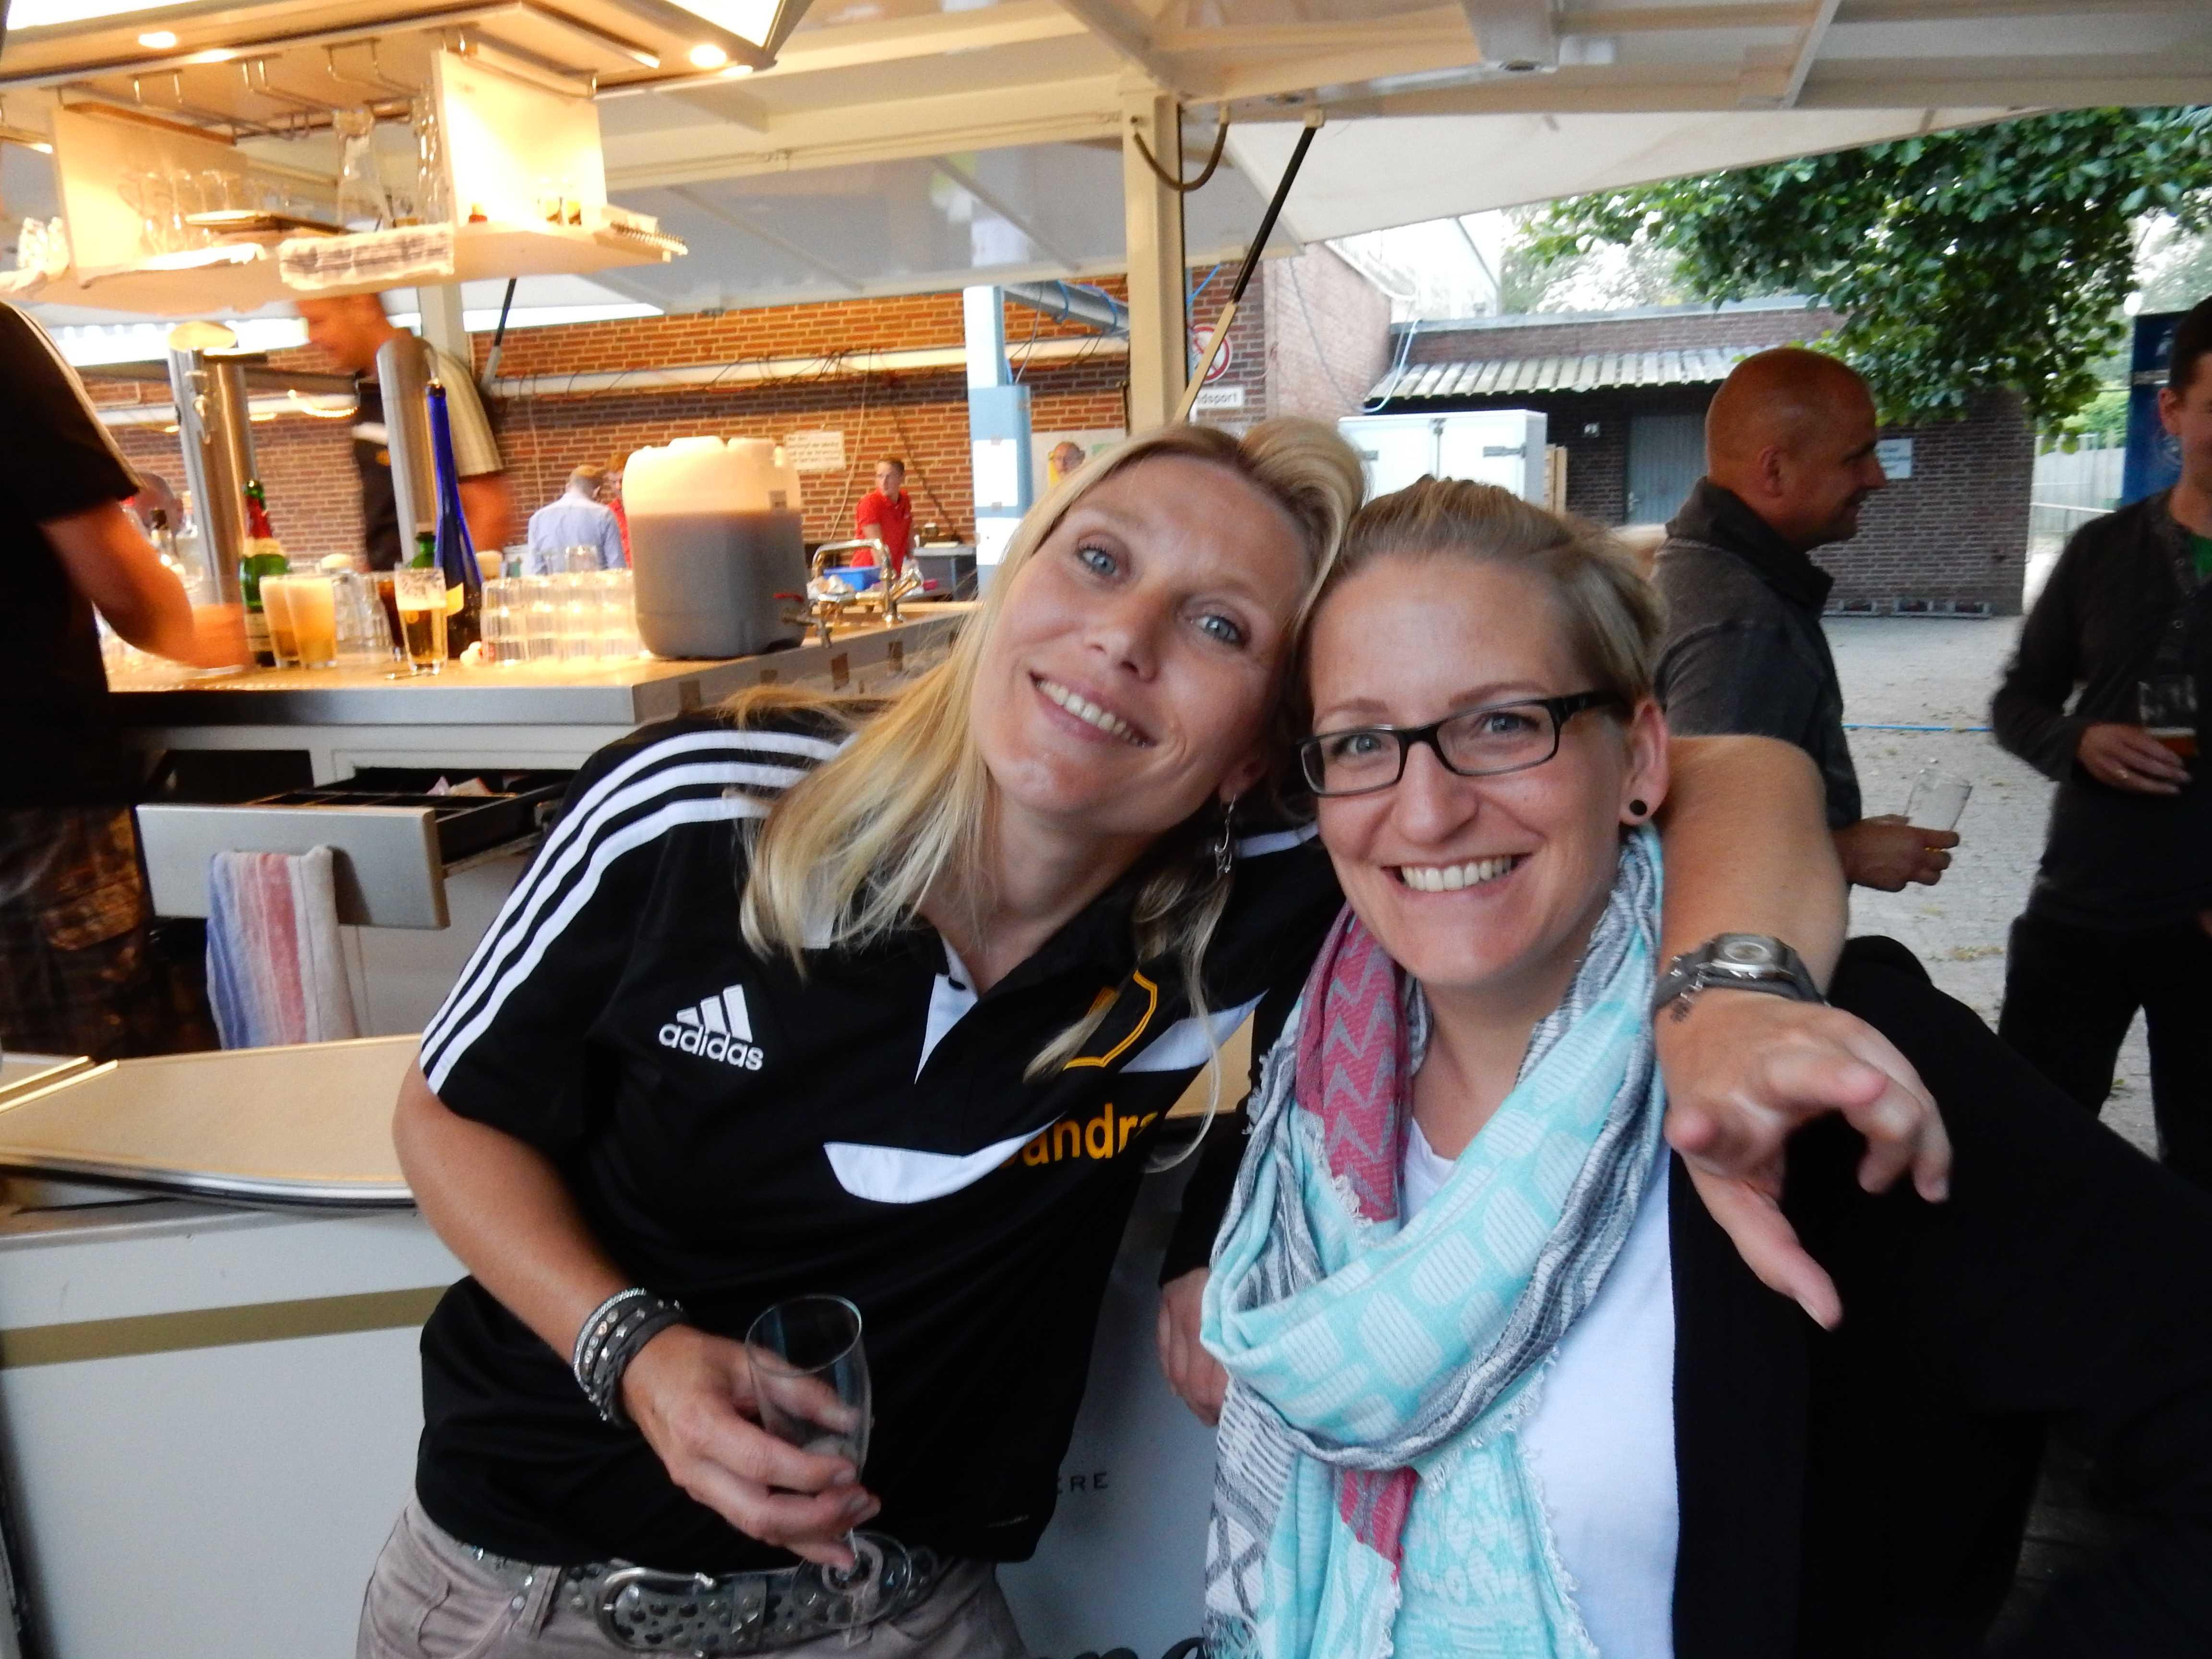 2016-07-28 Sportwoche - erster Donnerstag (52)